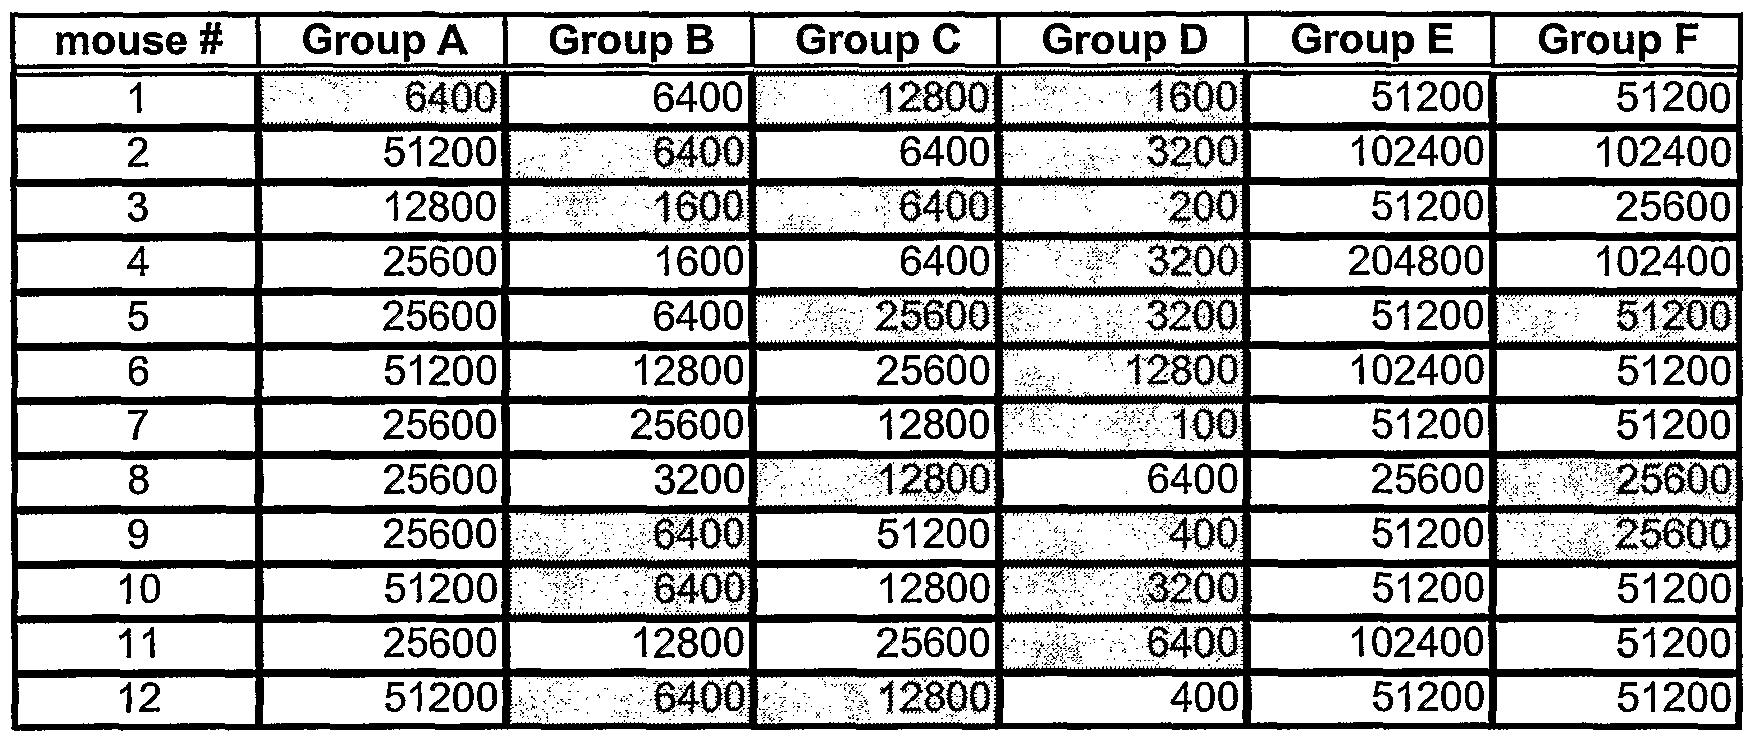 Gcu Academic Calendar 2021 20 | Printable Calendar 2020 2021 Throughout Academic Calendar 2021 20 Chamberlain